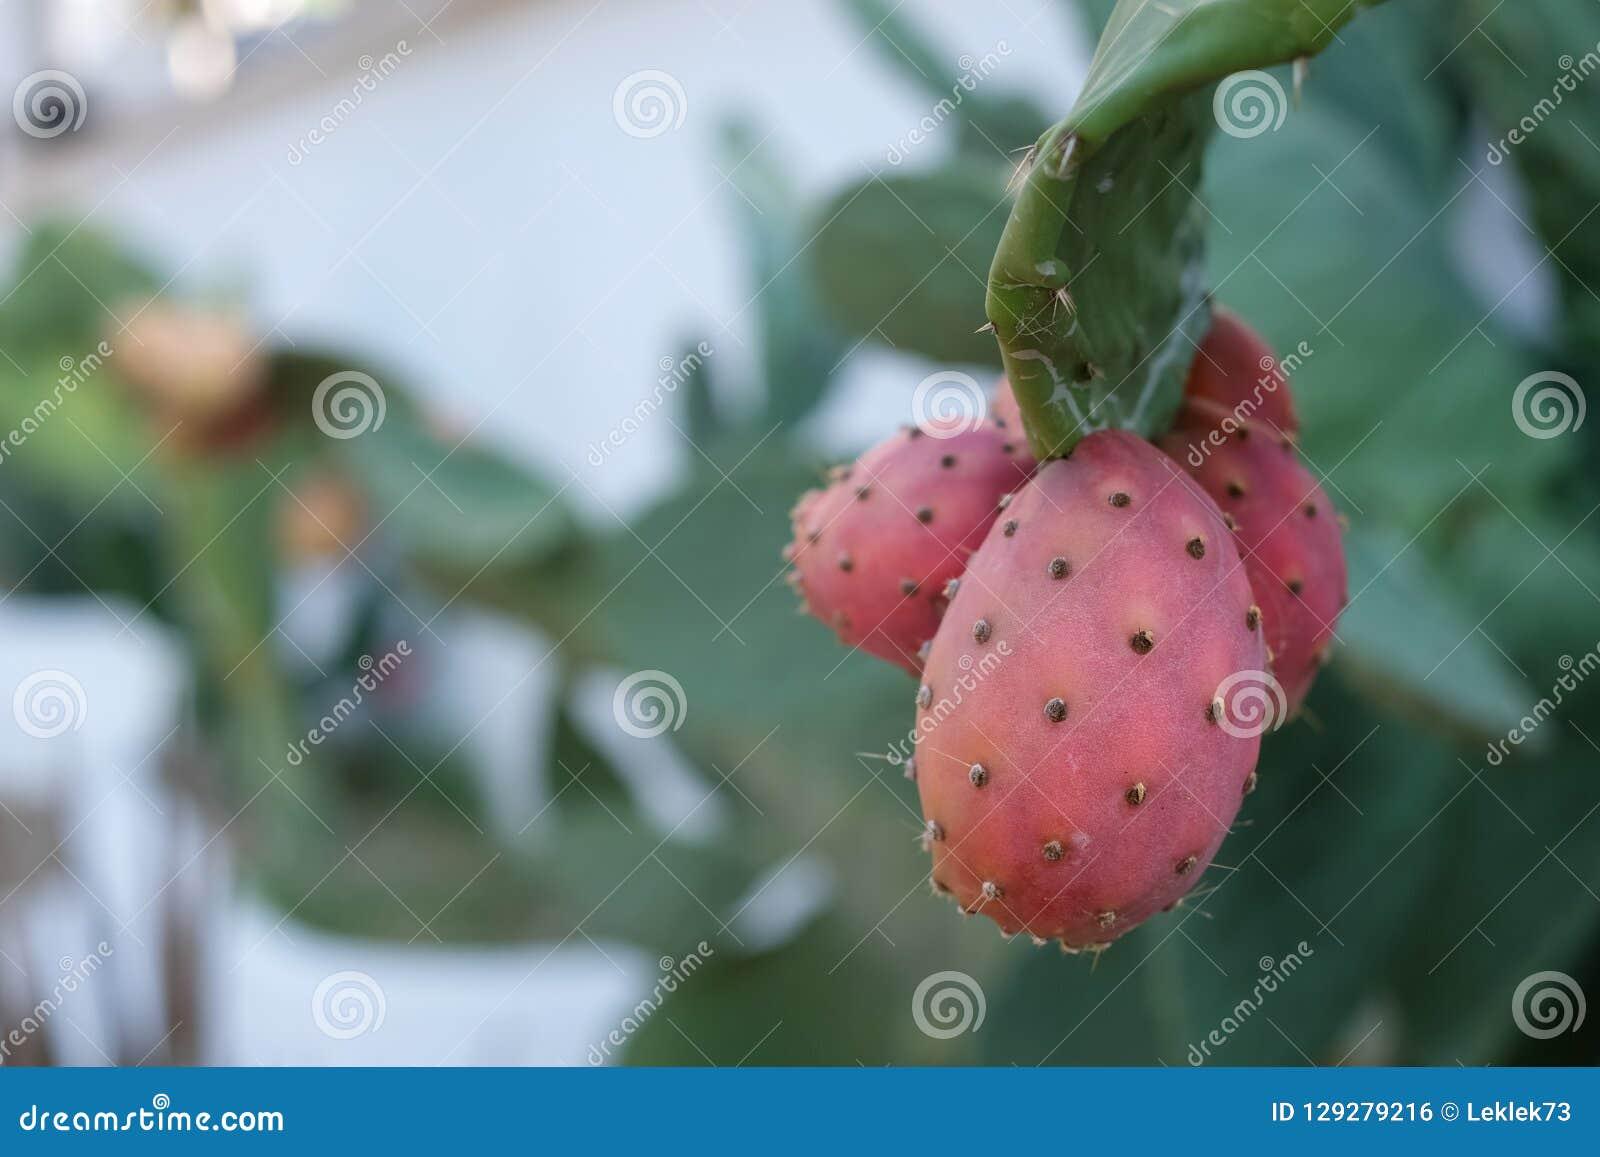 Prickly pear cactus fruit growing near Mattinata, Puglia, Italy